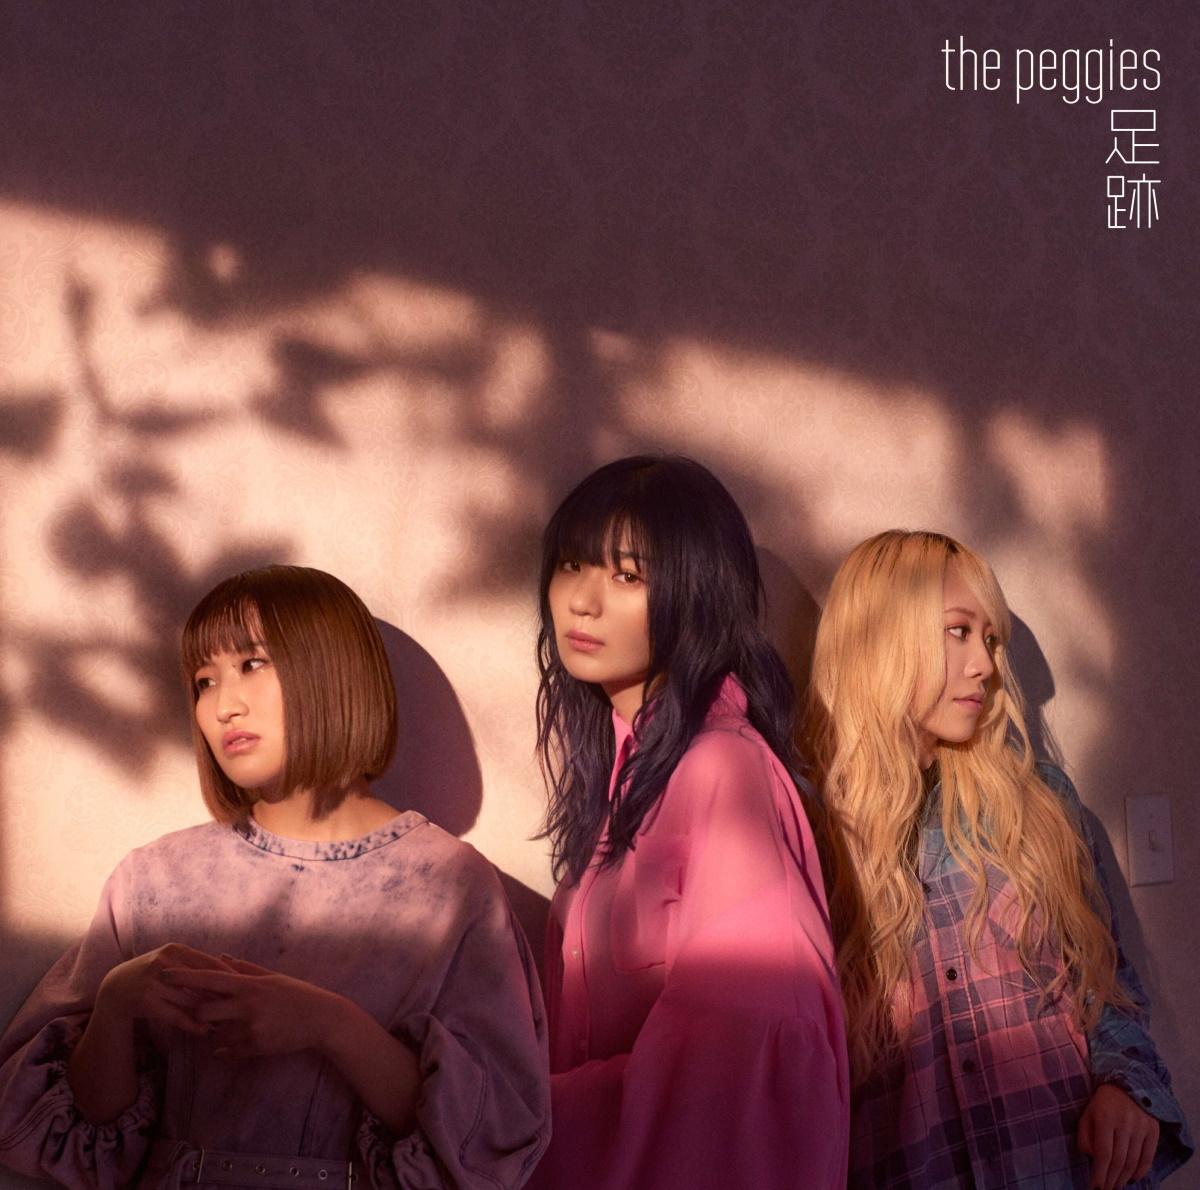 『the peggies - 足跡』収録の『足跡』ジャケット